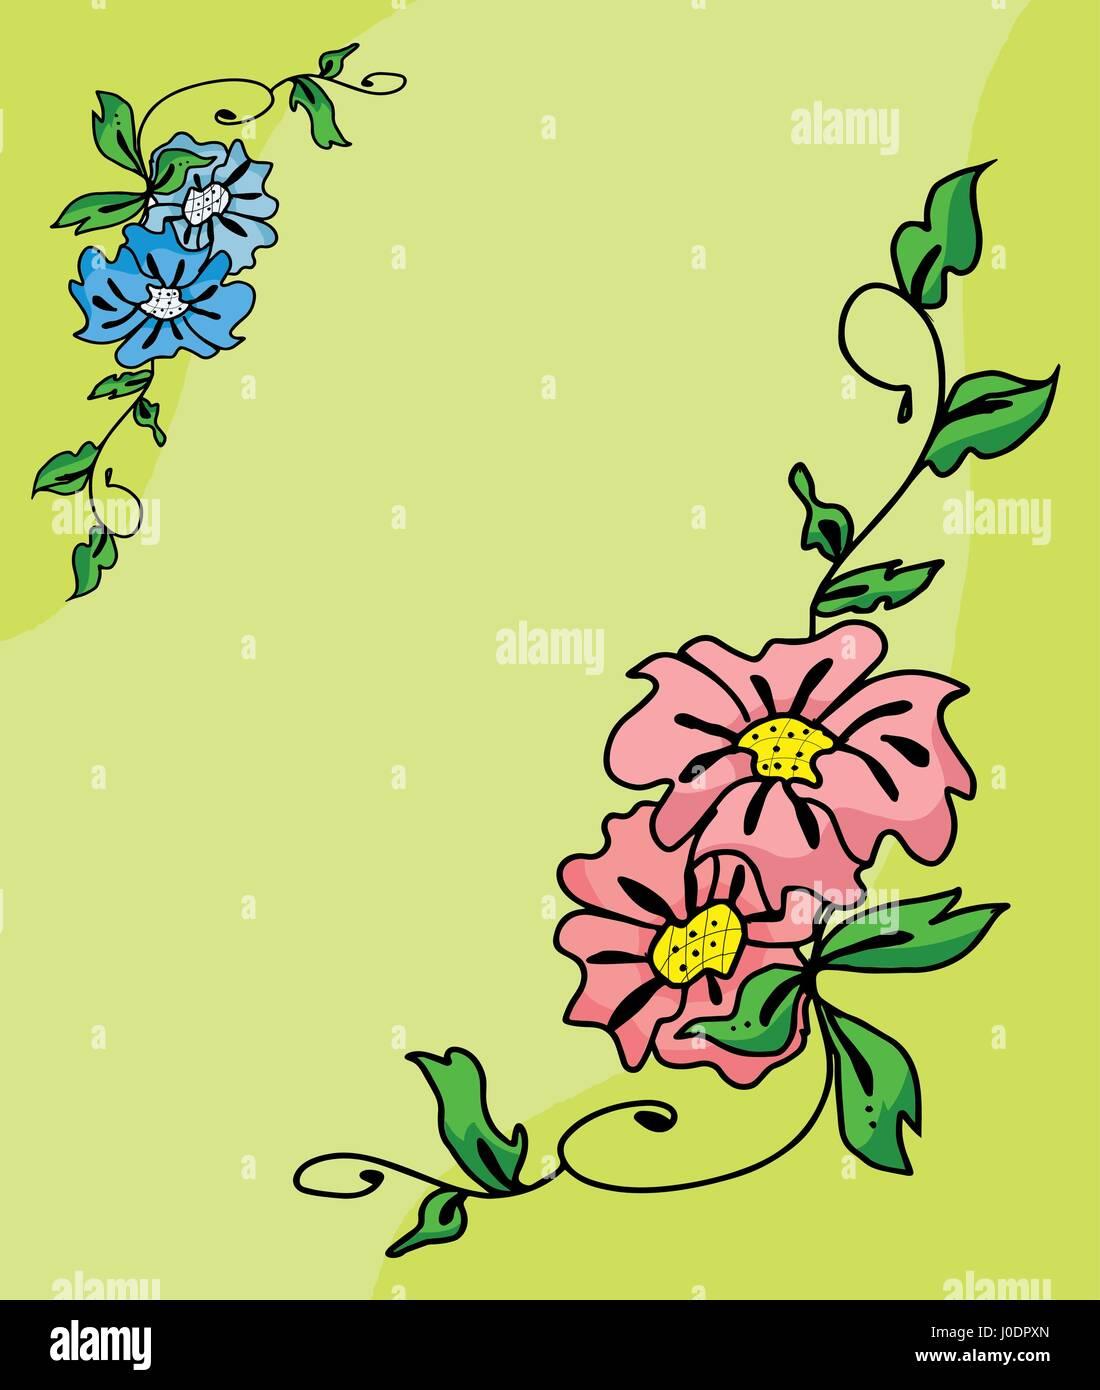 Bunte Blumen Rahmen Vektor Vektor Abbildung - Bild: 137986317 - Alamy